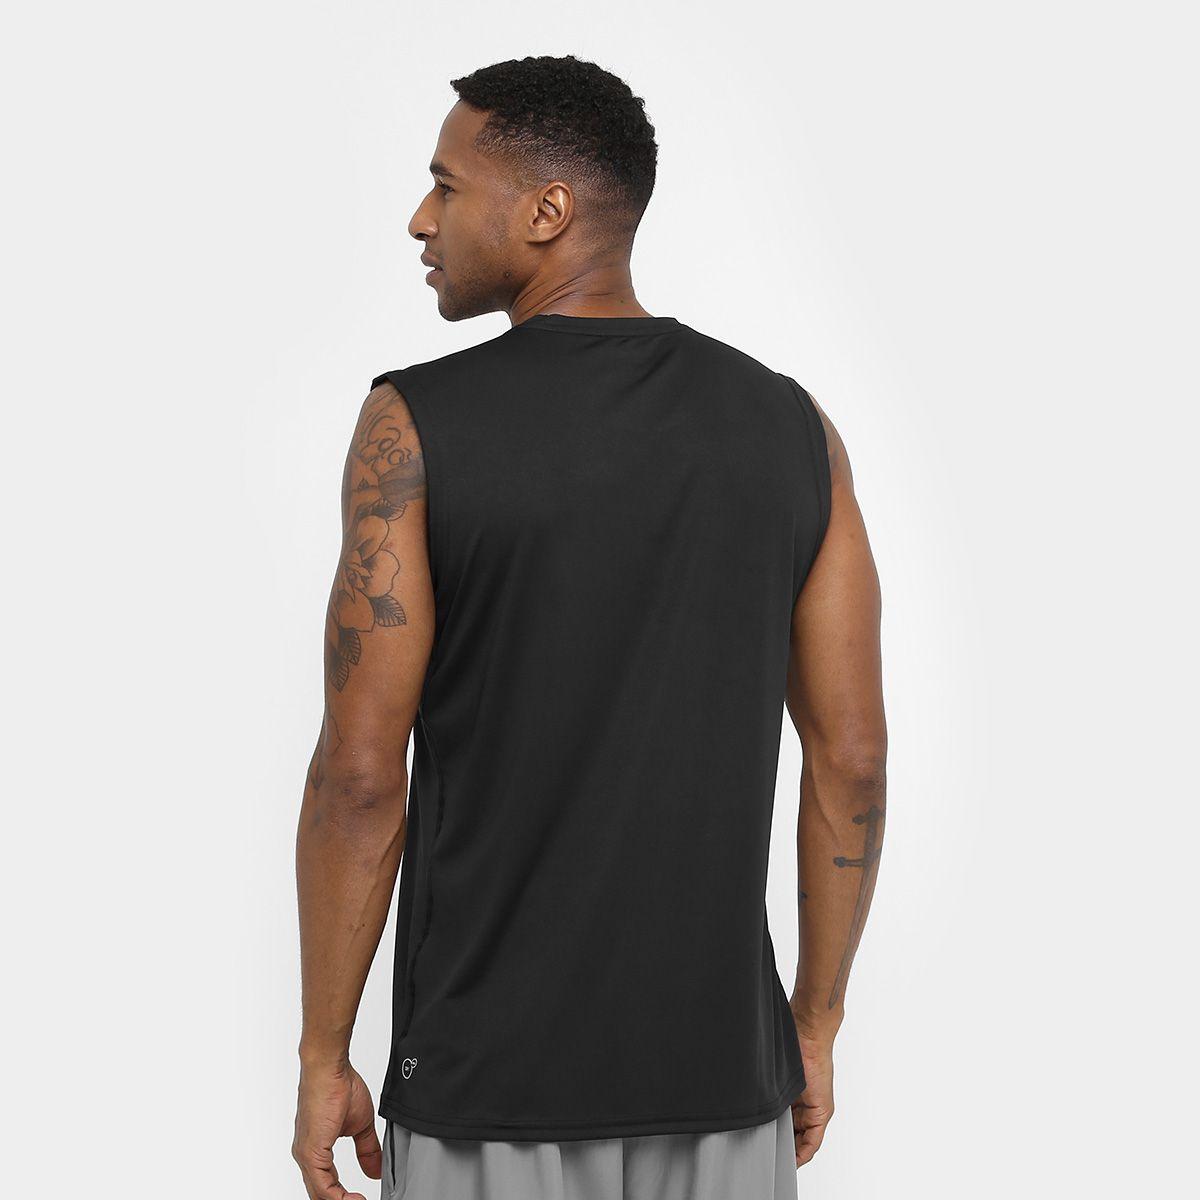 cb544a3bc1377 Camiseta Regata Puma Essential Sleeveless - Masculina - Preto - Titanes  Esportes